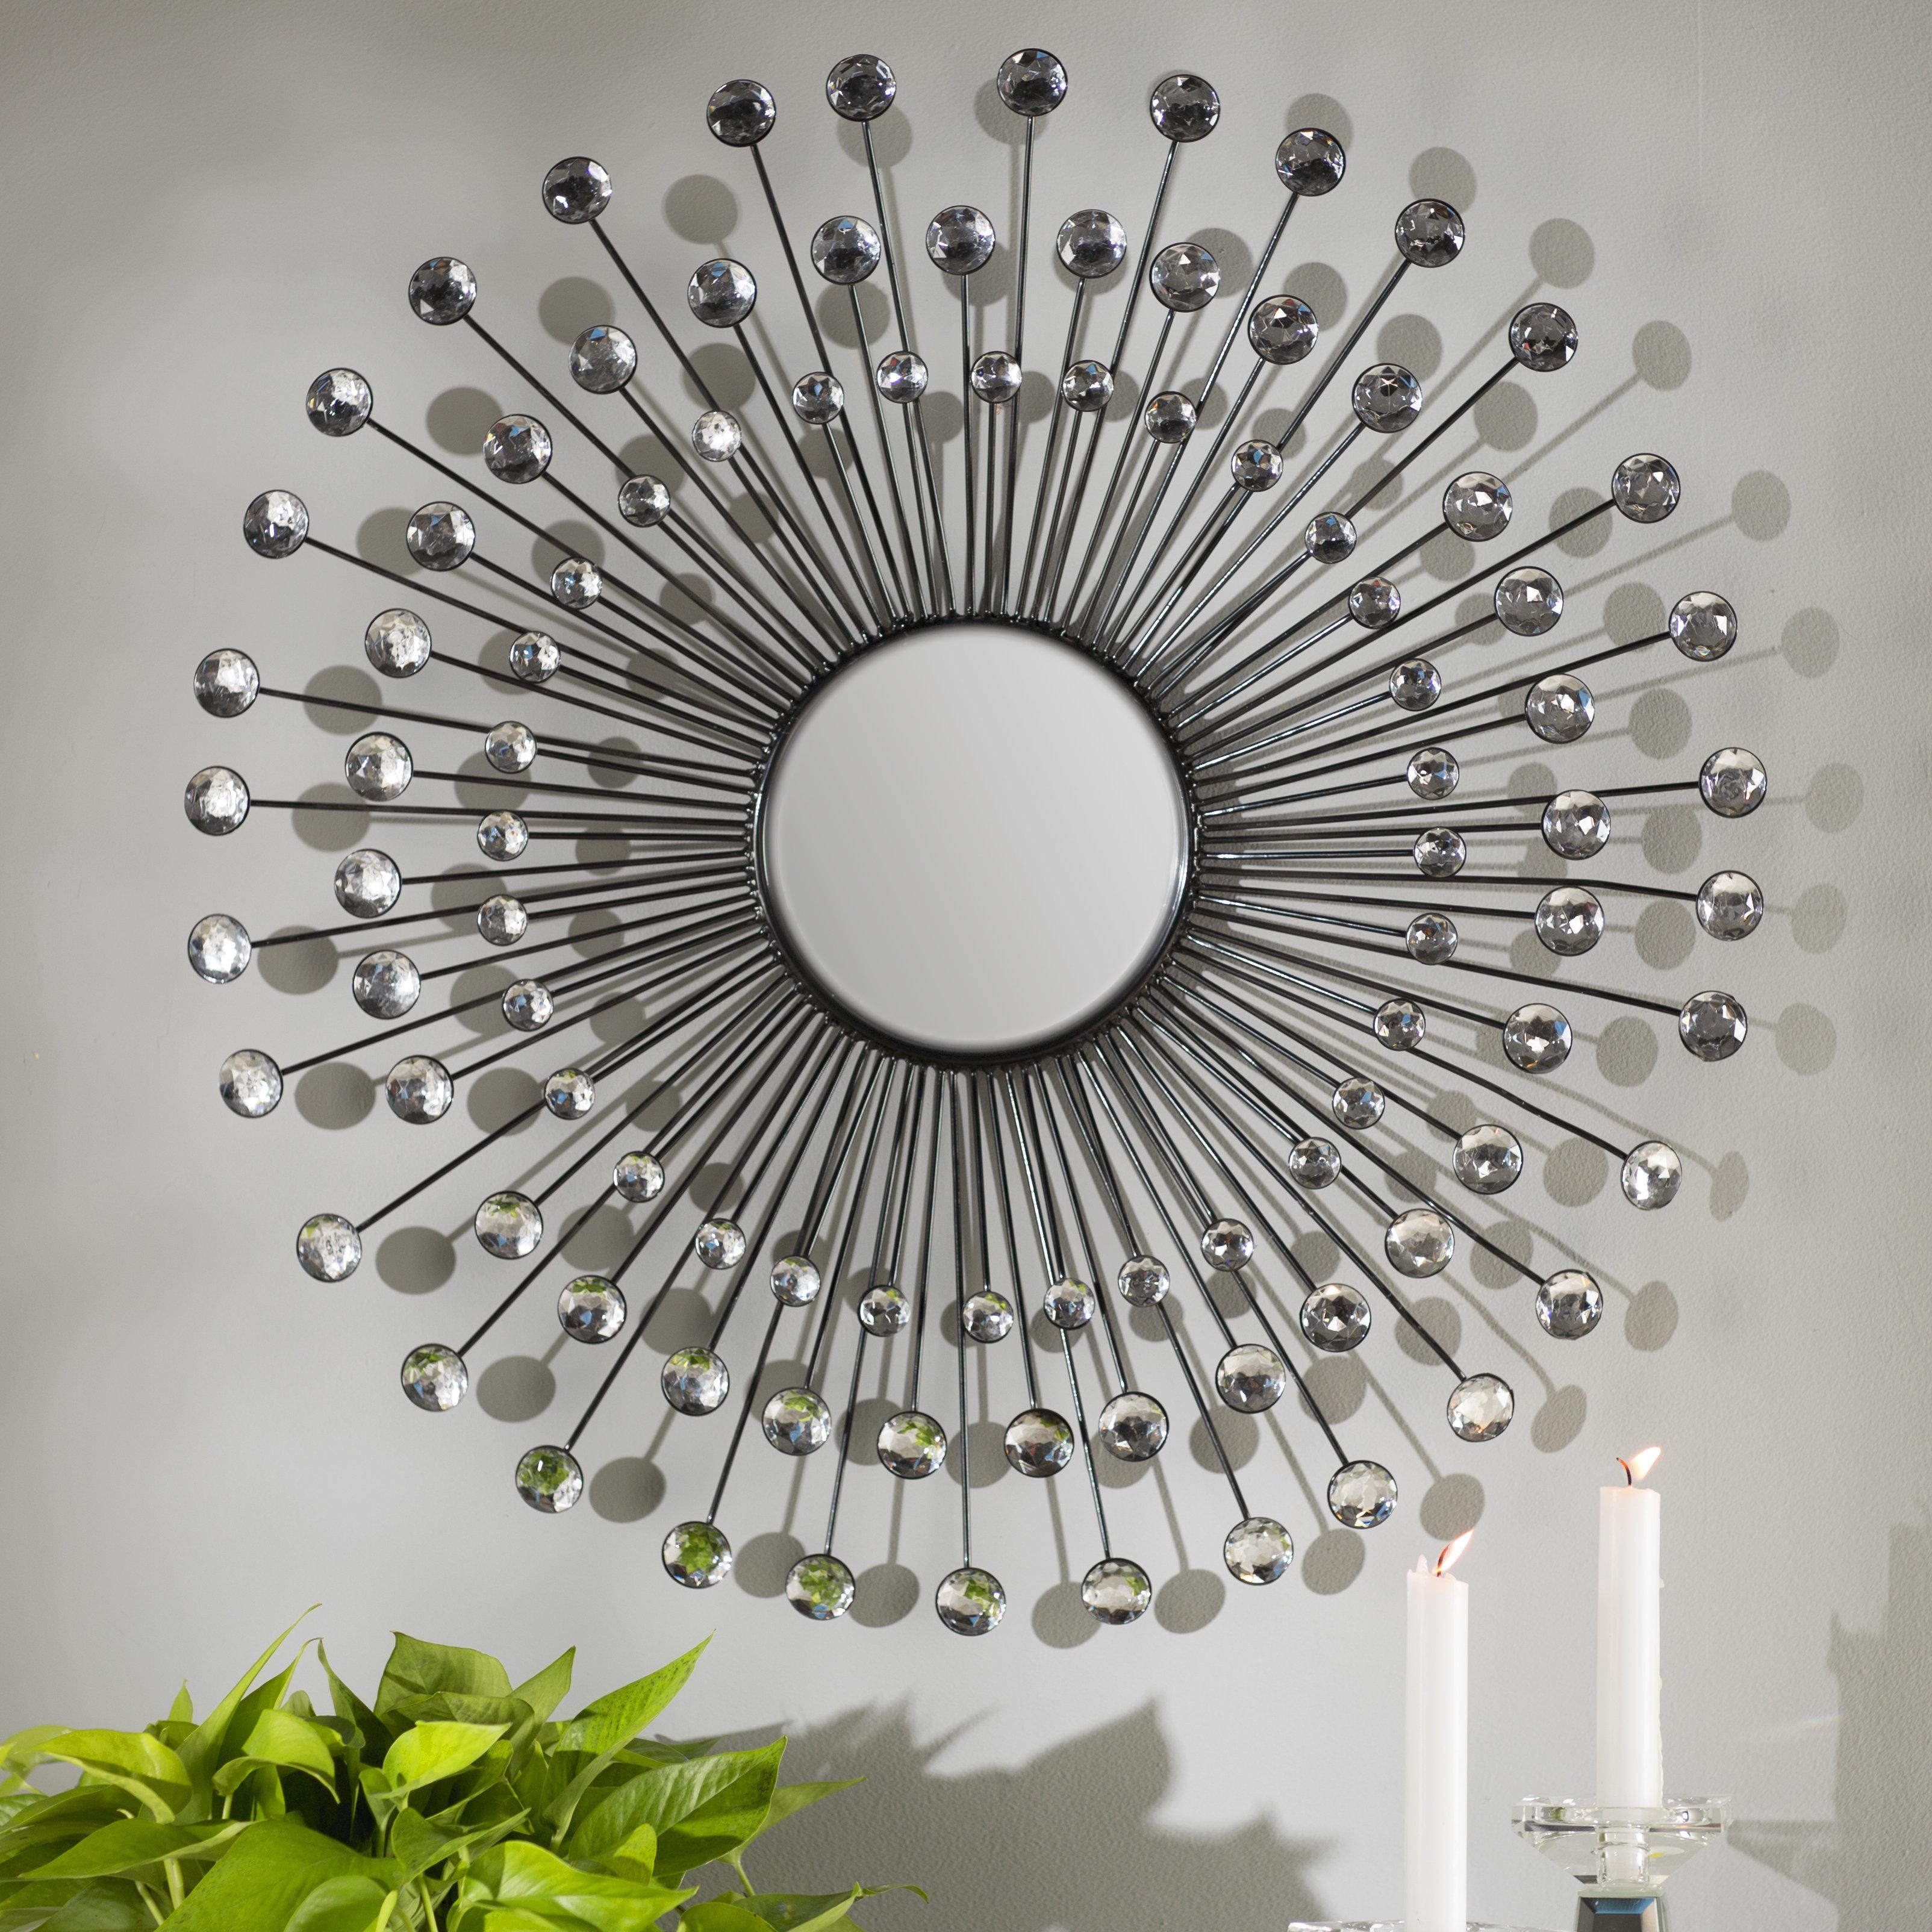 Estrela Modern Sunburst Metal Wall Mirror Regarding 2019 Crystal Wall Mirrors (Gallery 18 of 20)